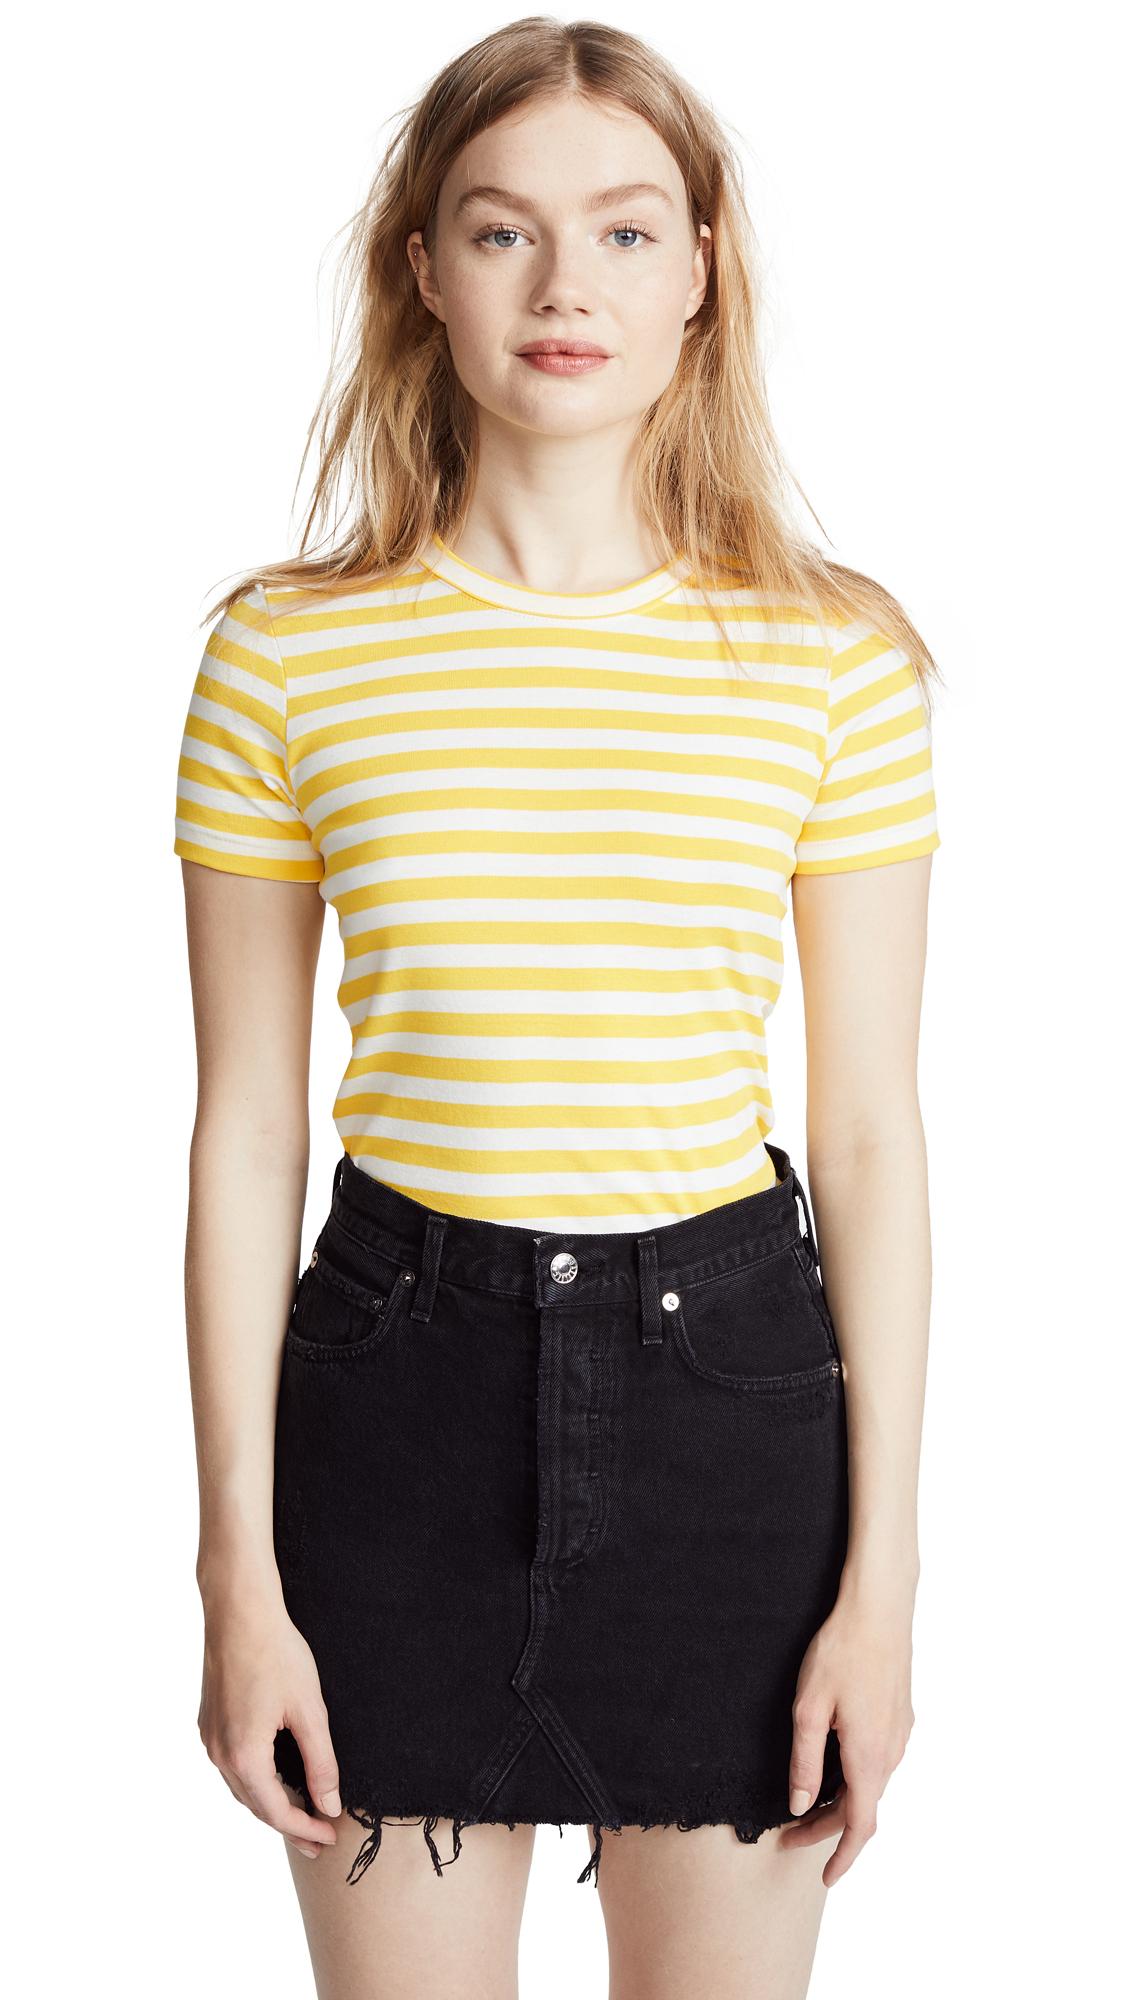 Kollette petit bateau iconic 1x1 striped tee the world for Petit bateau striped shirt